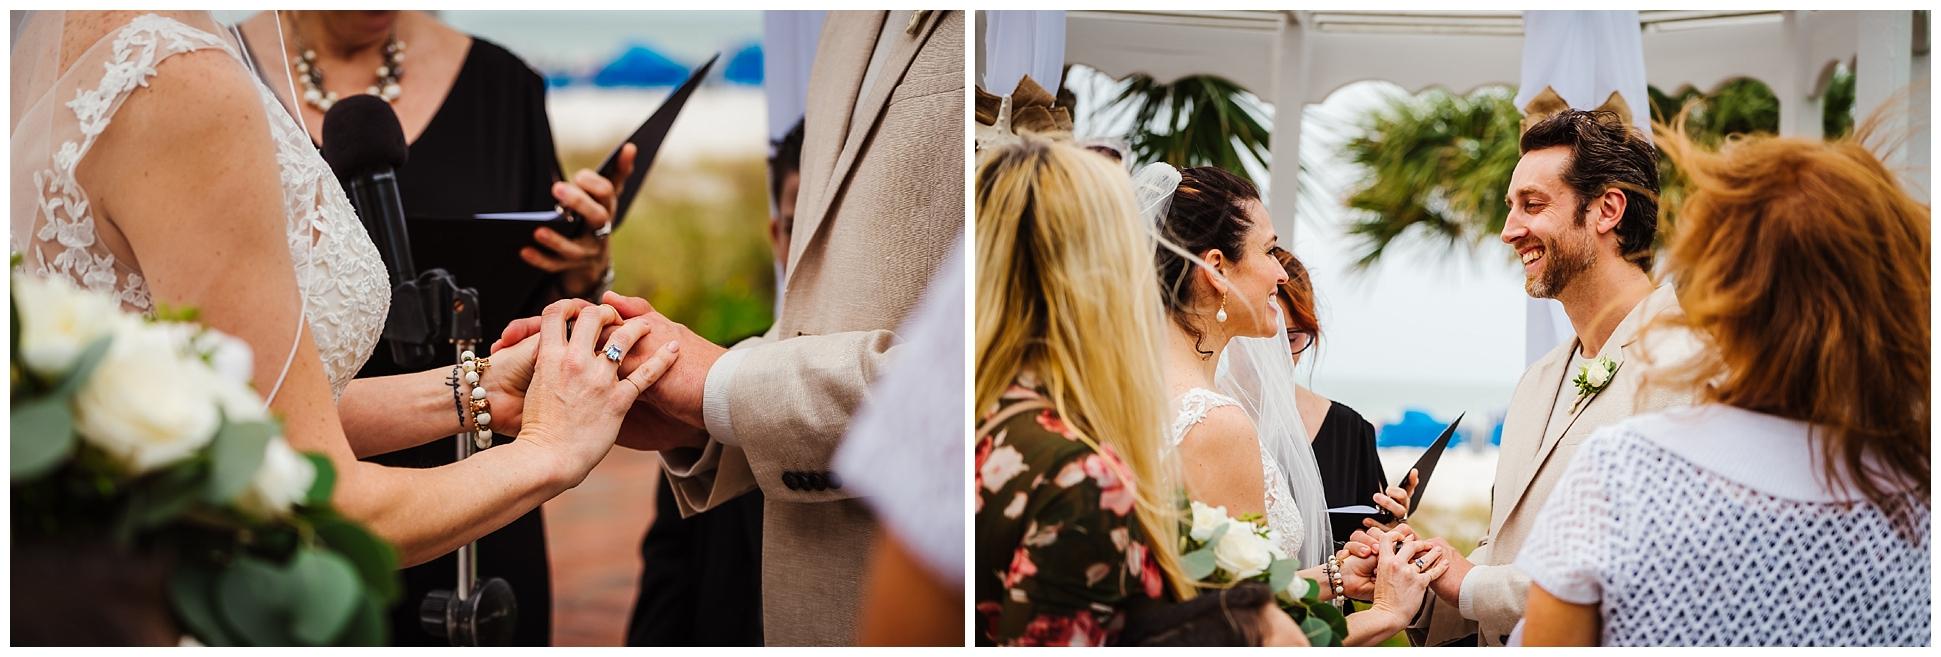 tampa-wedding-photographer-tradewinds-beach-family-elopement_0100.jpg